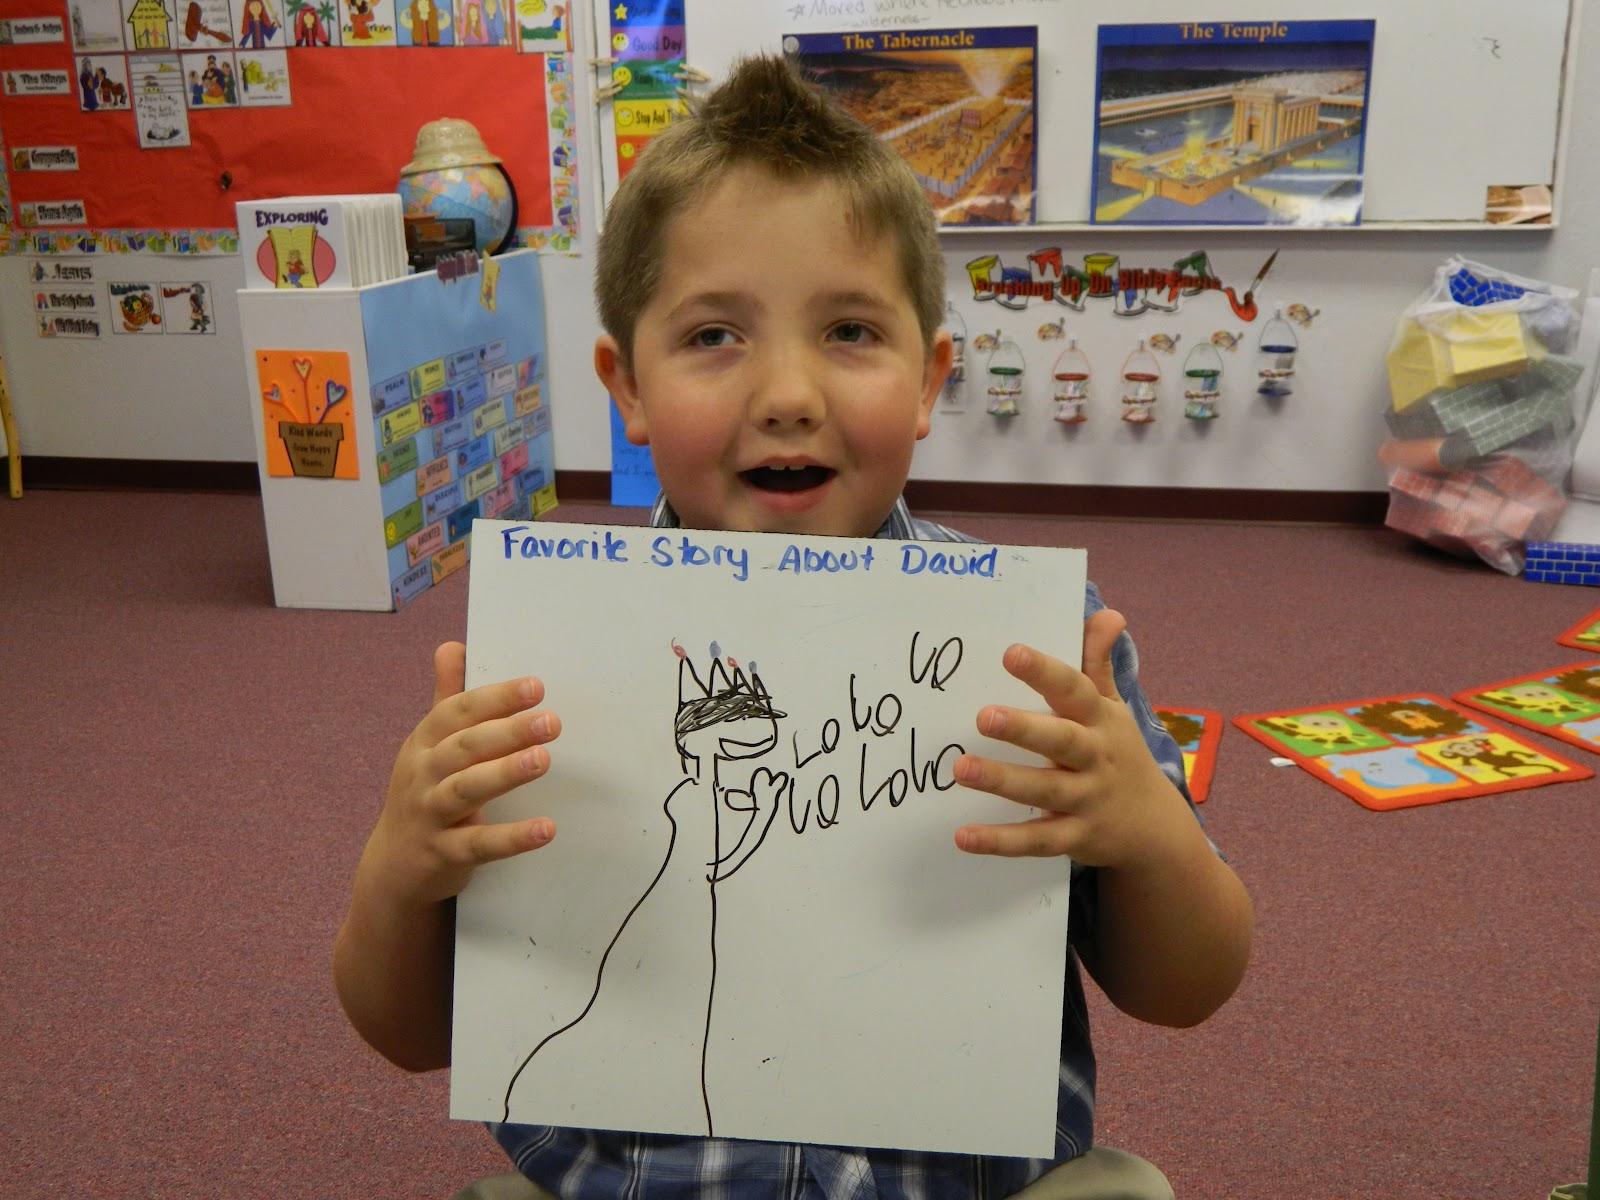 King David Drawing a Picture of King David